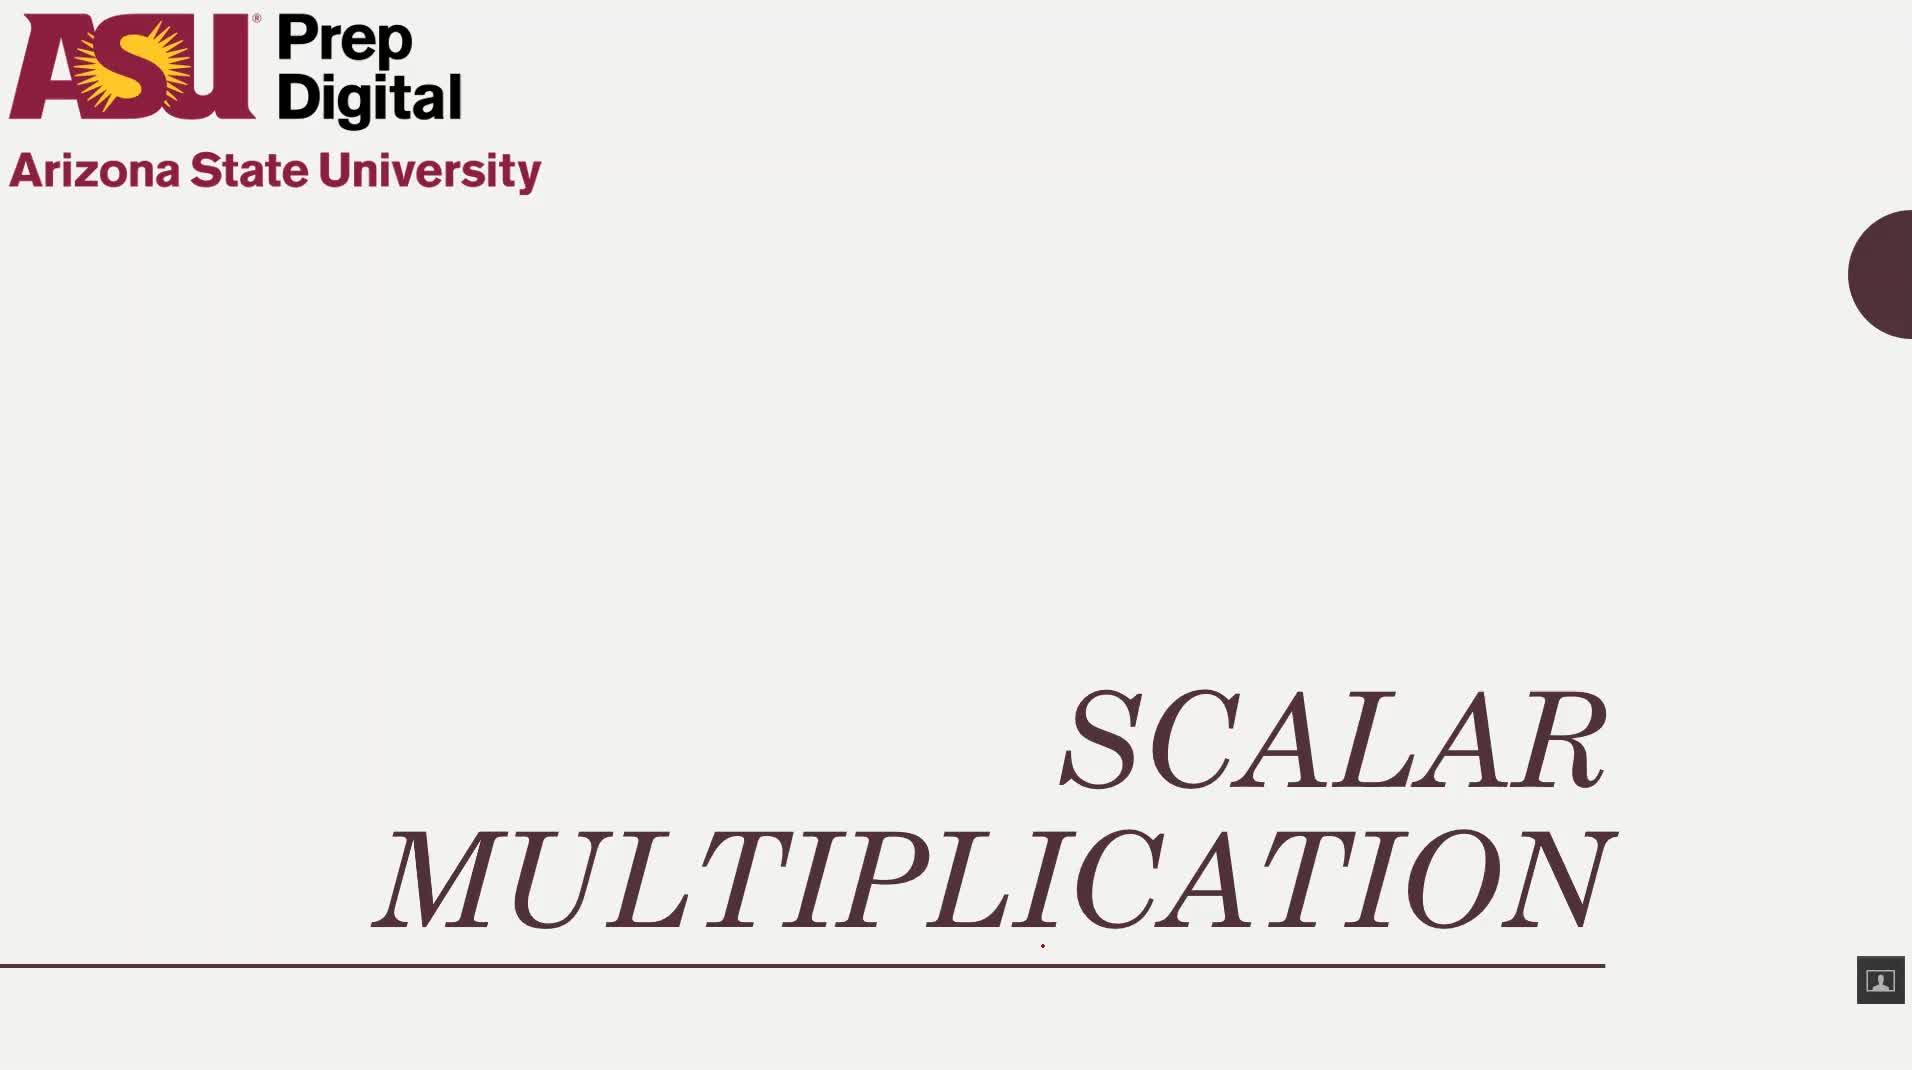 Scalar Multiplication of Matrices